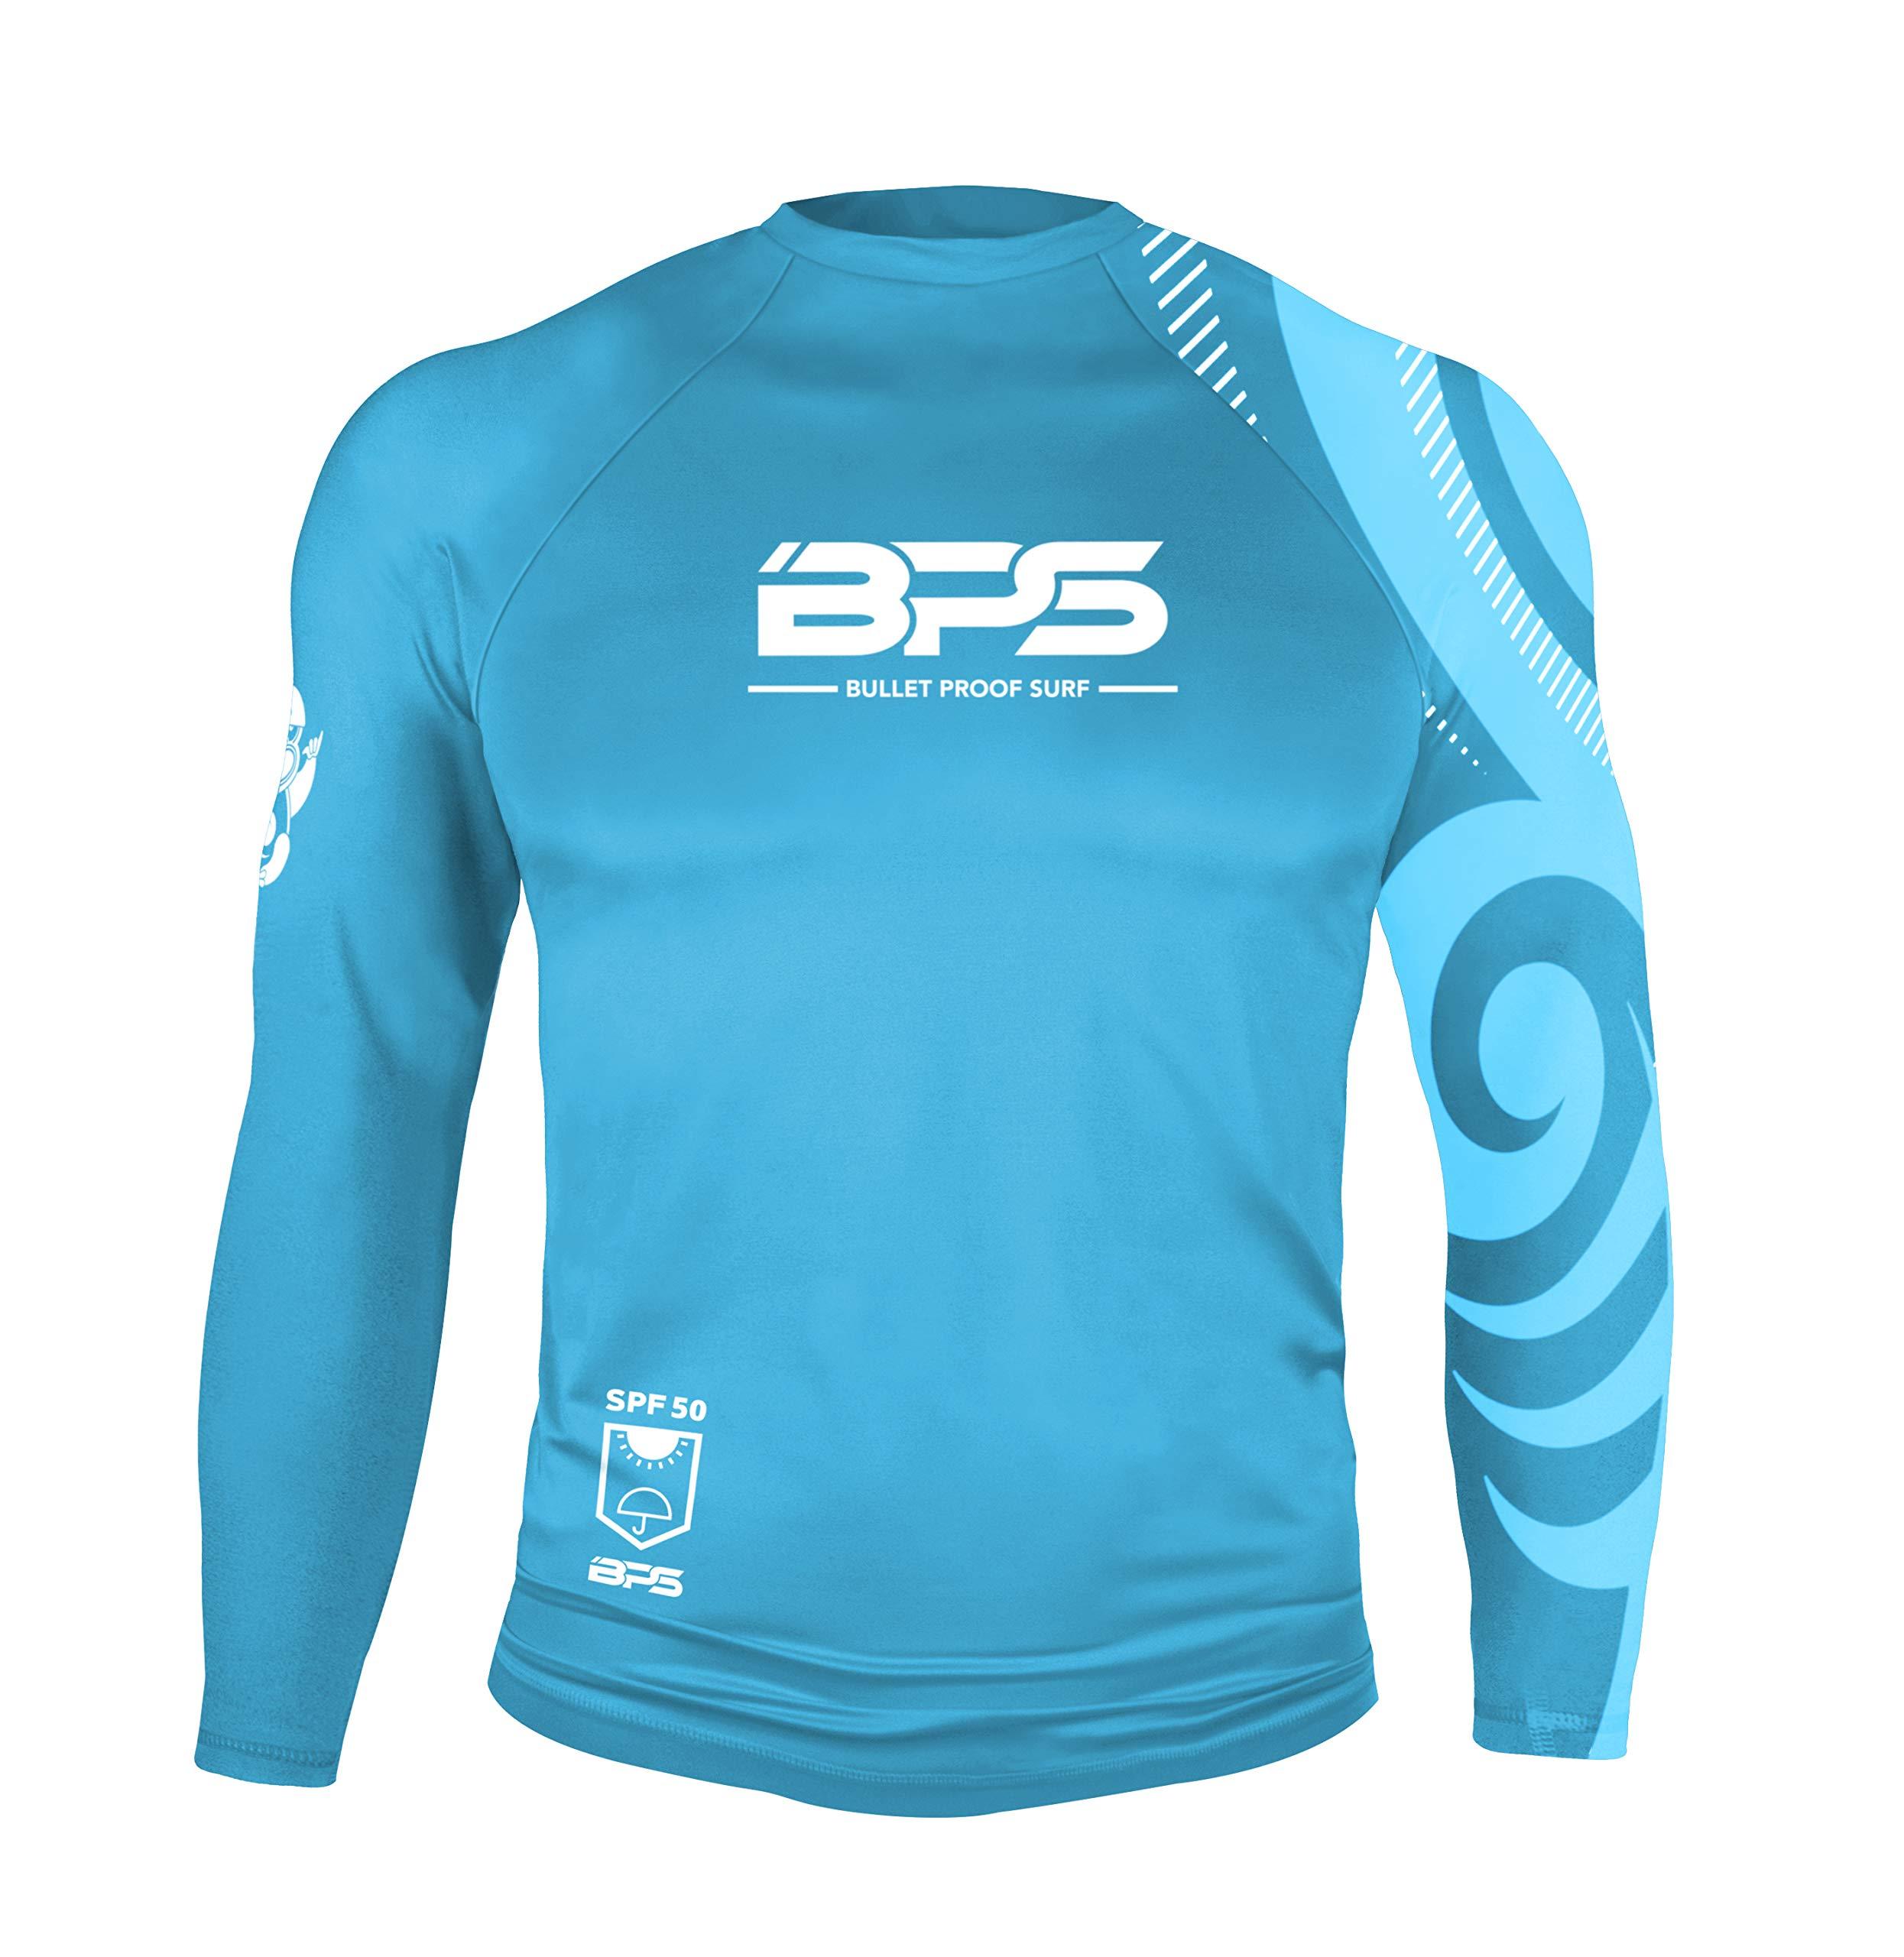 BPS Men's Colorful Long Sleeve Rash Shirt, Patterned Light Blue - White Logo (L)